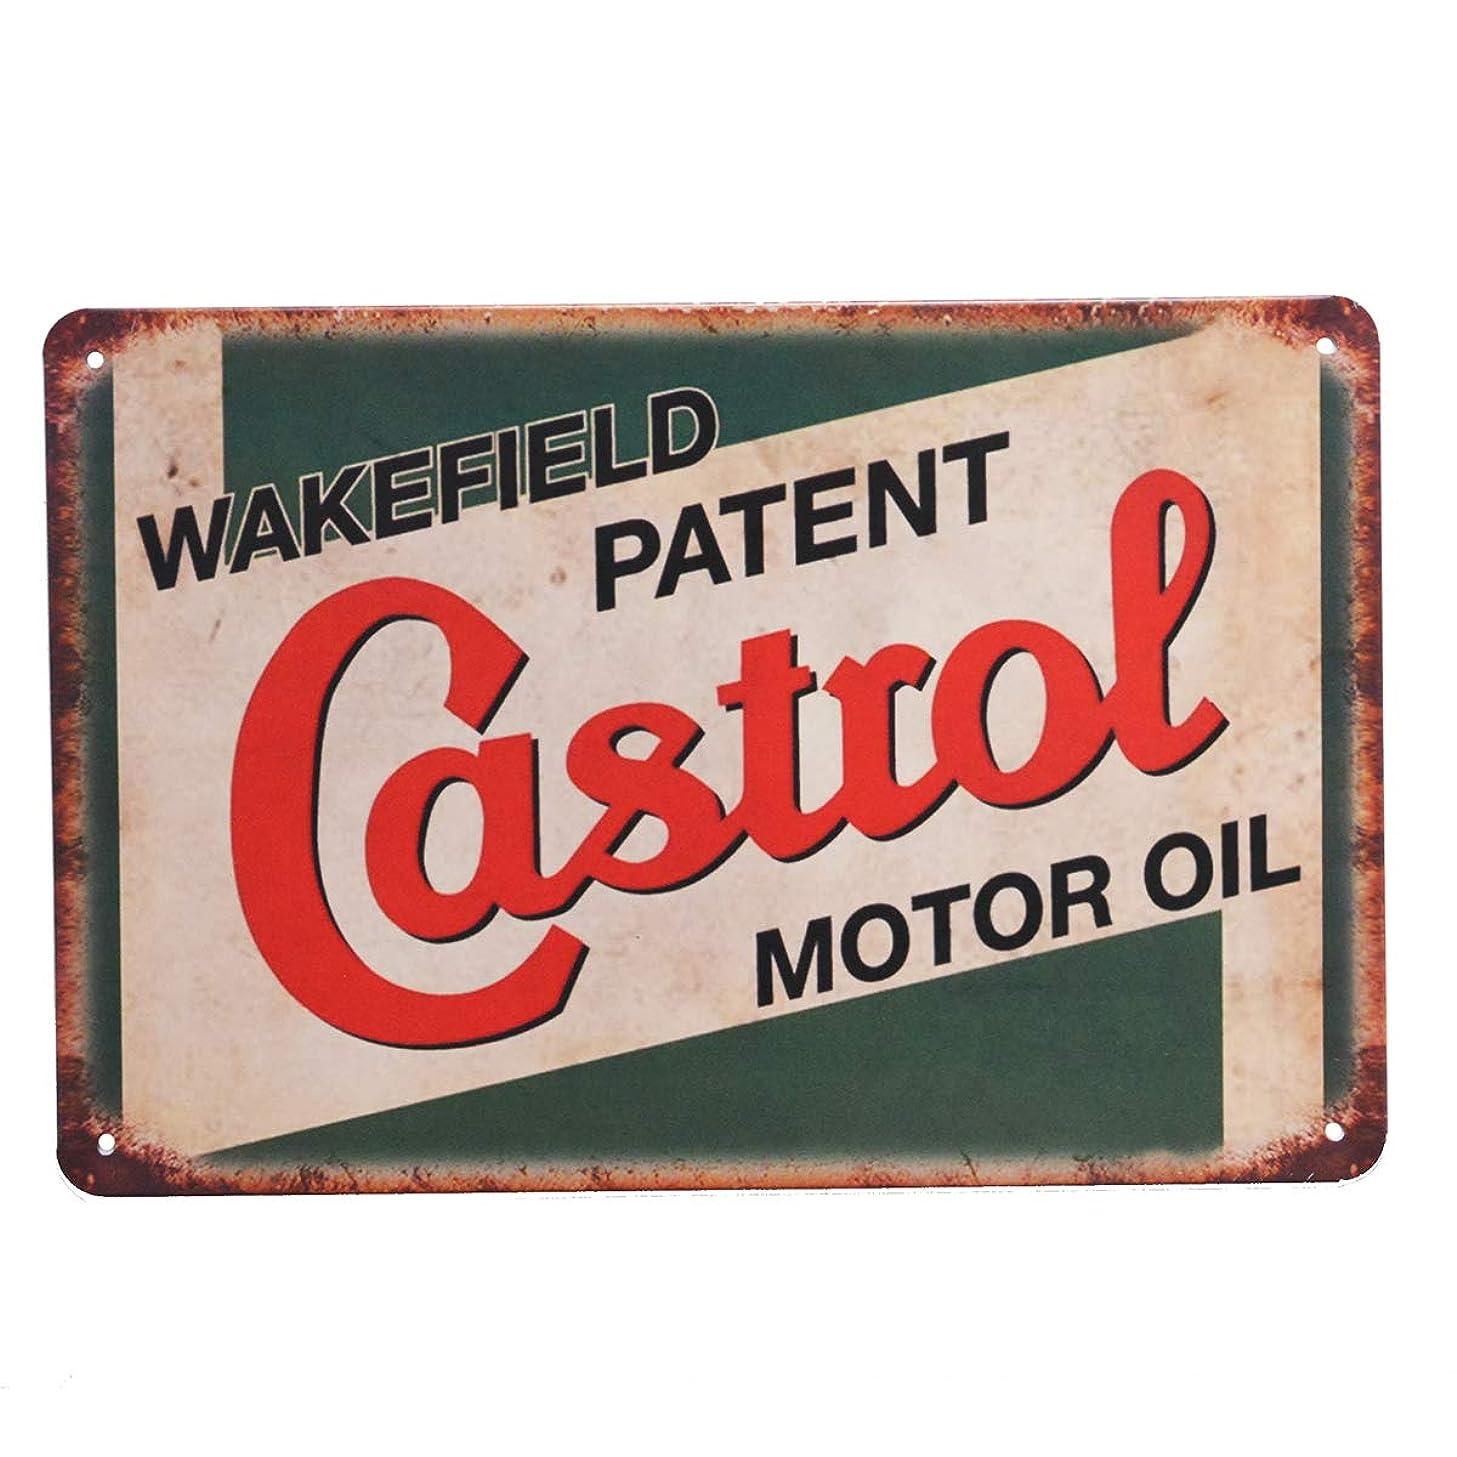 PEI's Retro Vintage Tin Metal Sign, Castrol Motor Oil, Wall Decor for Home Garage Bar Man Cave, 8x12/20x30cm